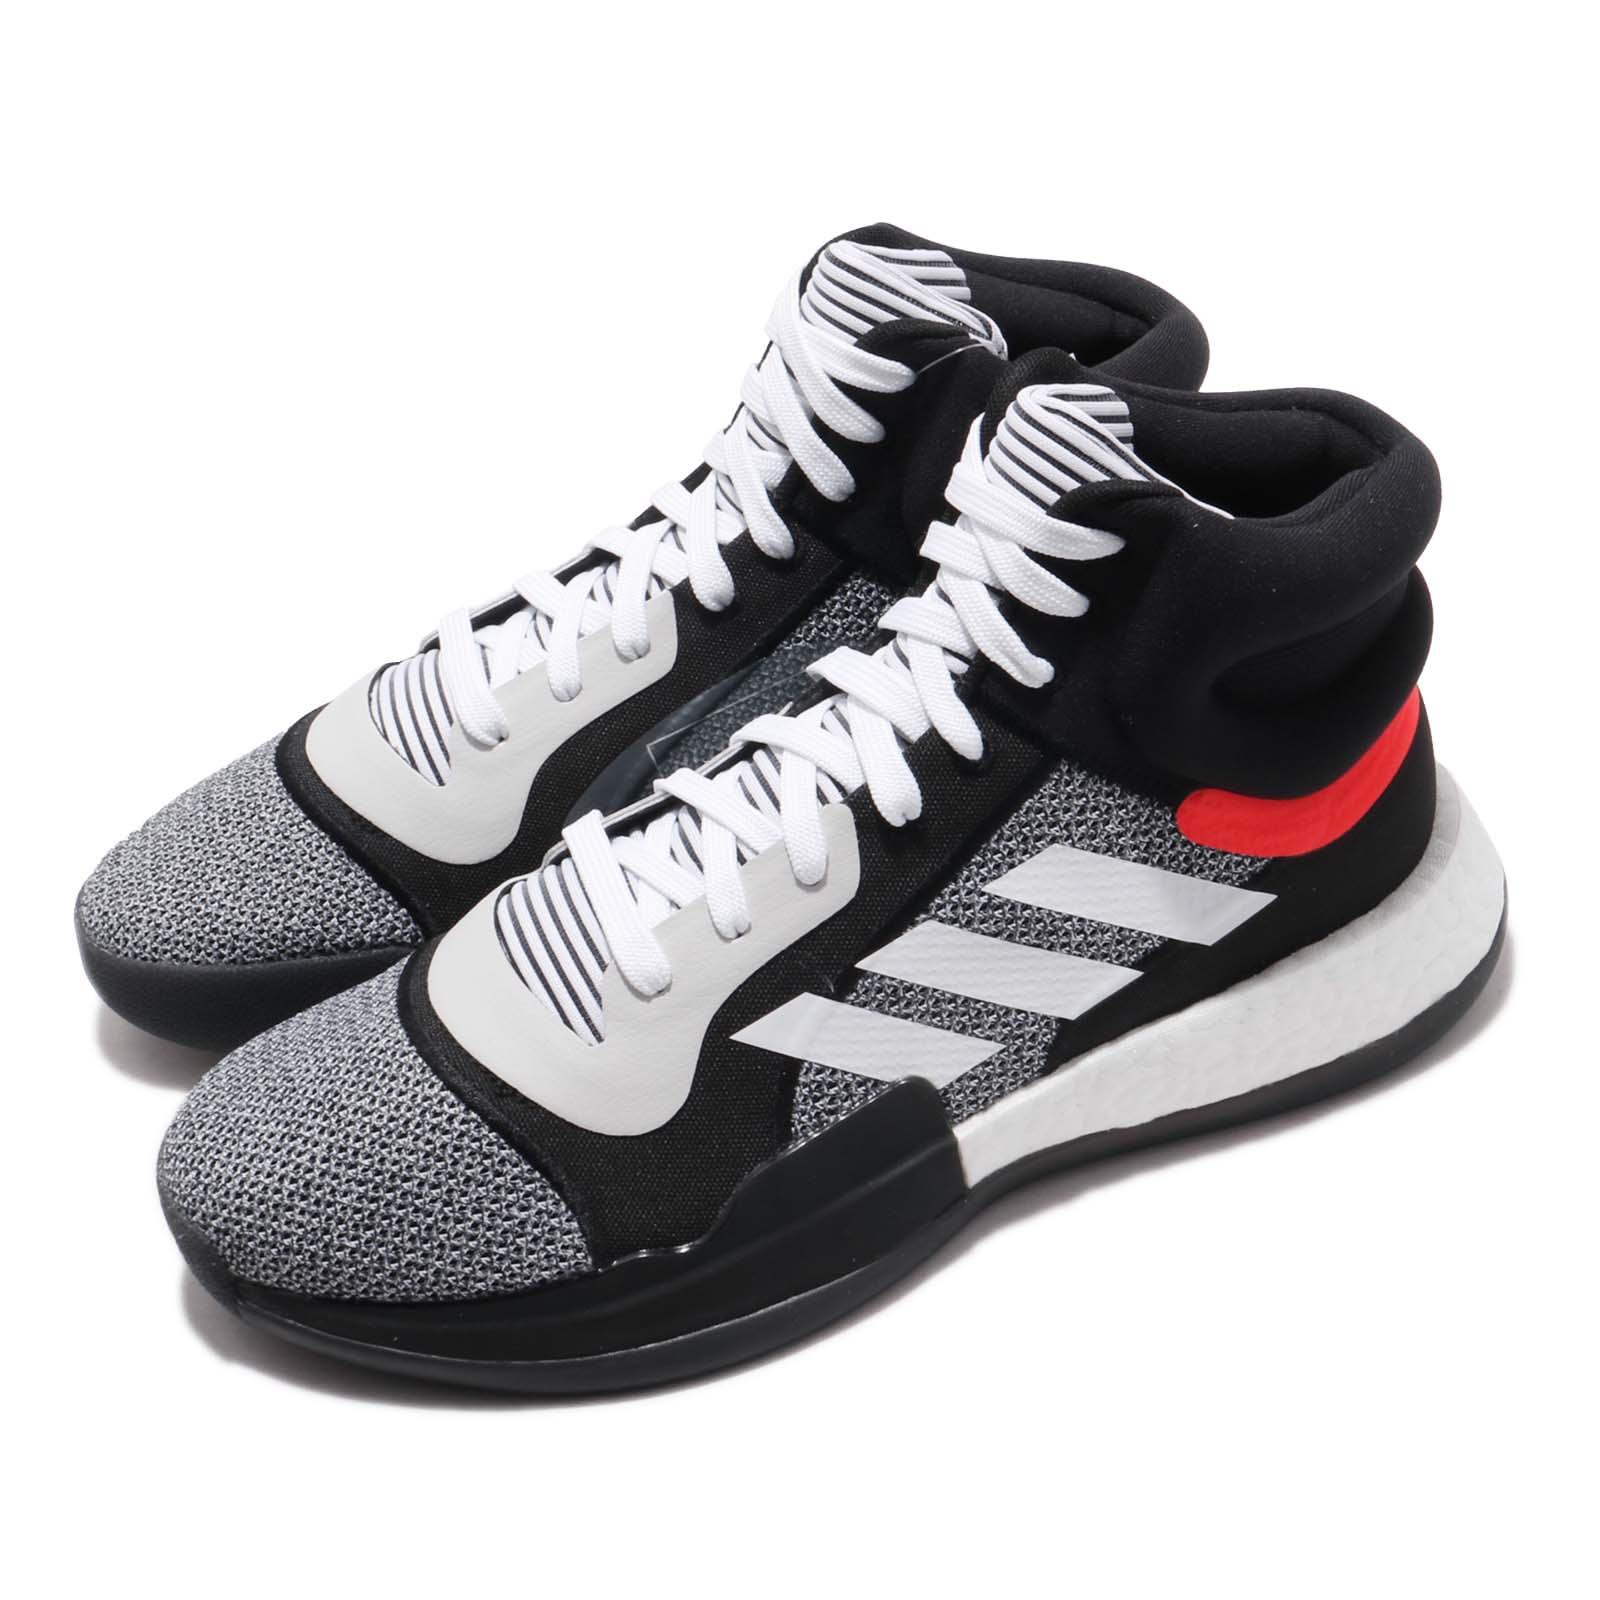 adidas 籃球鞋 Marquee Boost 高筒 男鞋 BB7822